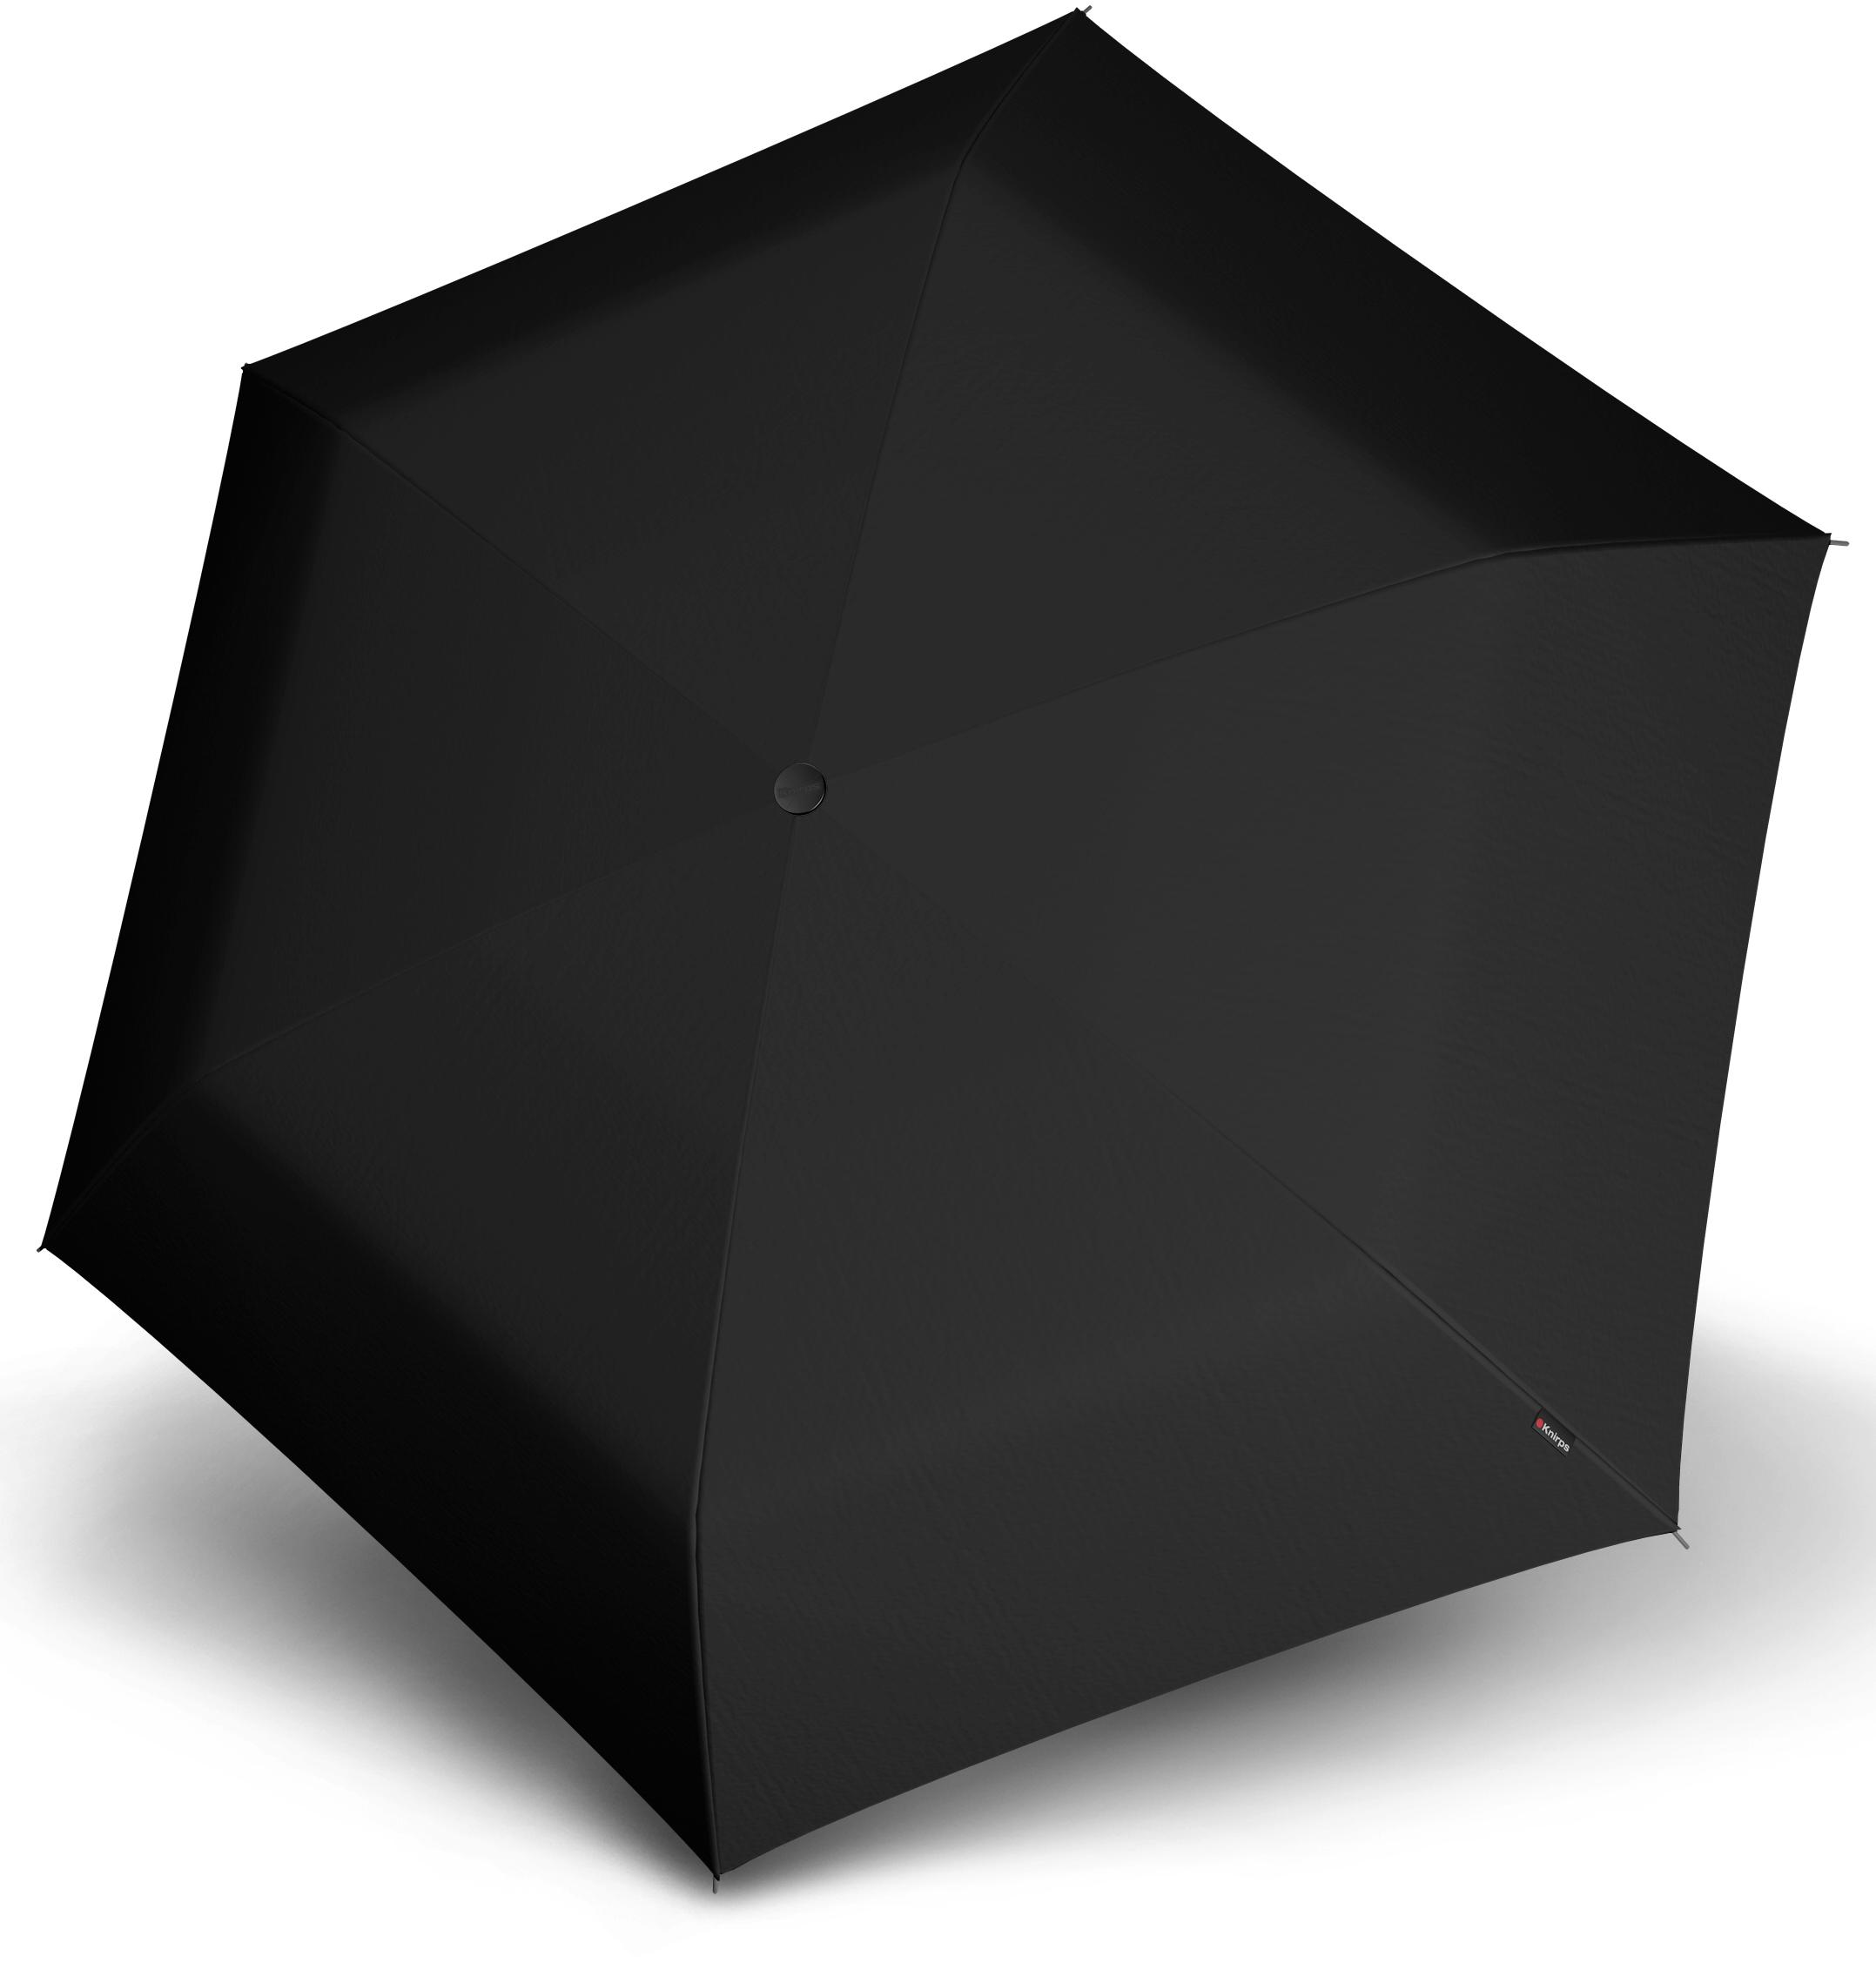 Knirps® Regenschirm - Taschenschirm, »TS.200 Slim Medium Duomatic black«   Accessoires > Regenschirme > Taschenschirme   Schwarz   Wo   KNIRPS